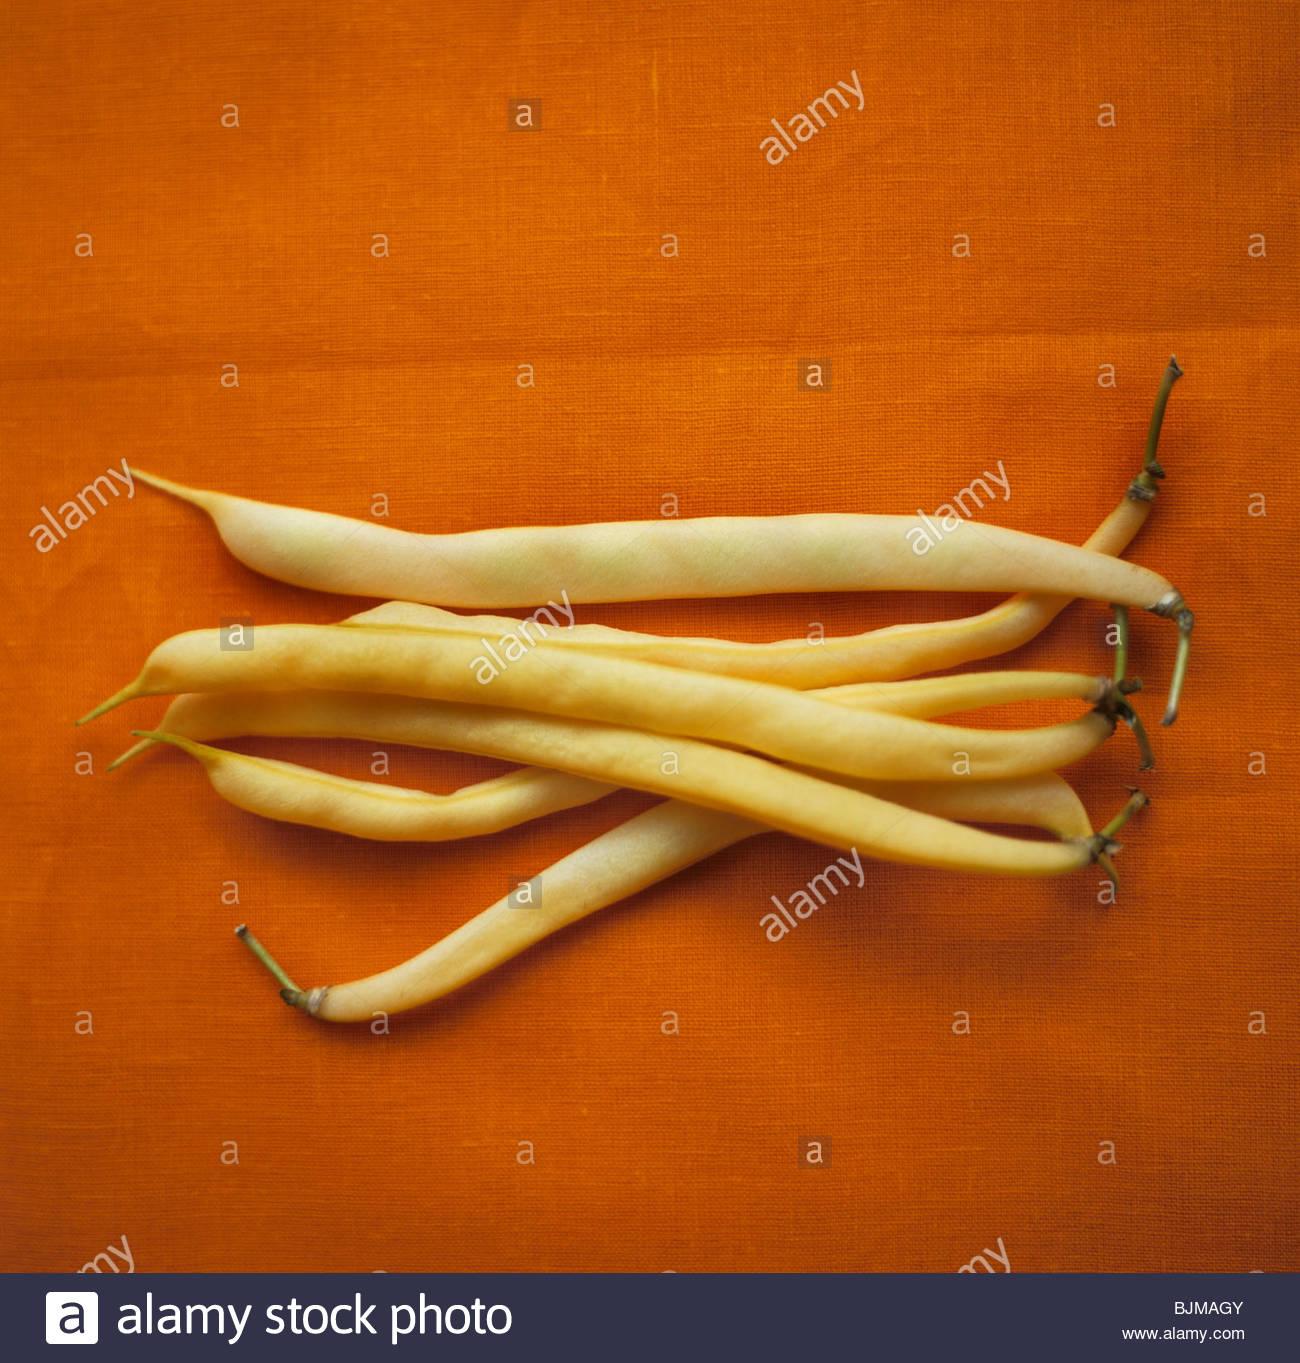 Wax beans against orange background - Stock Image